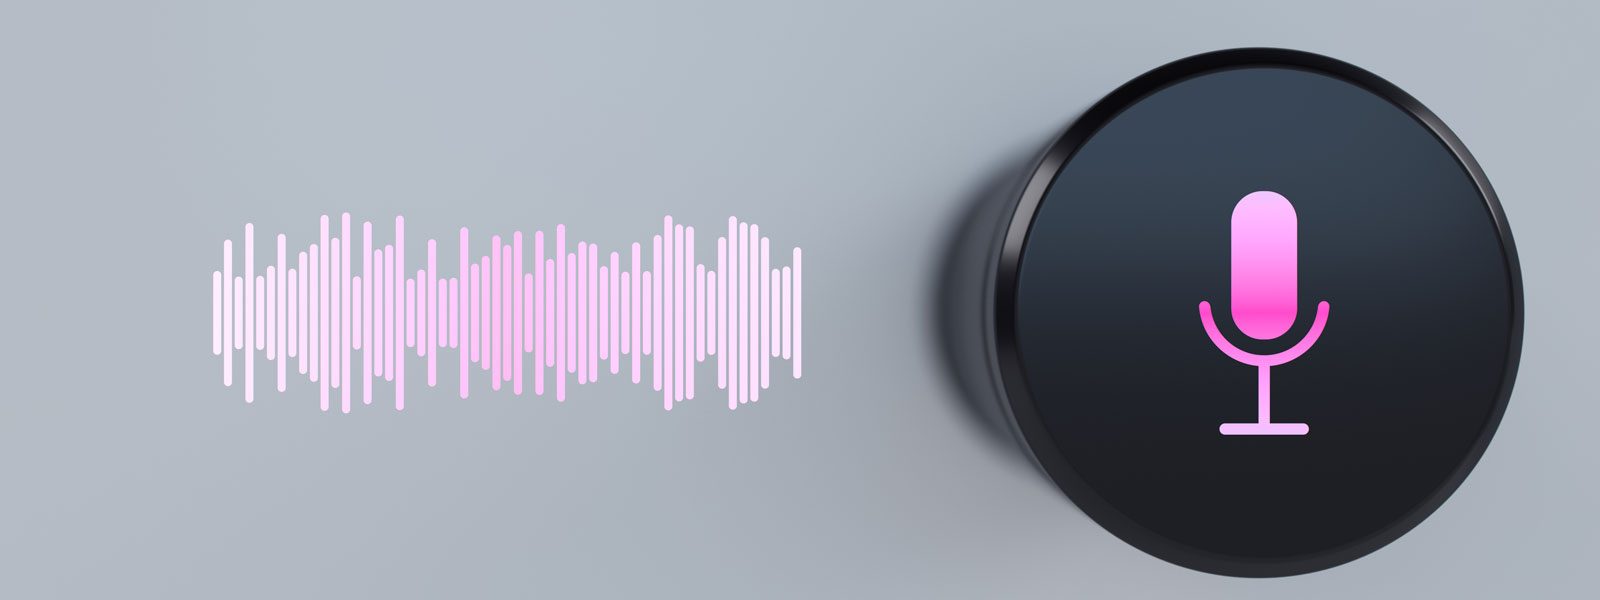 Voice App Analytics Featured Image